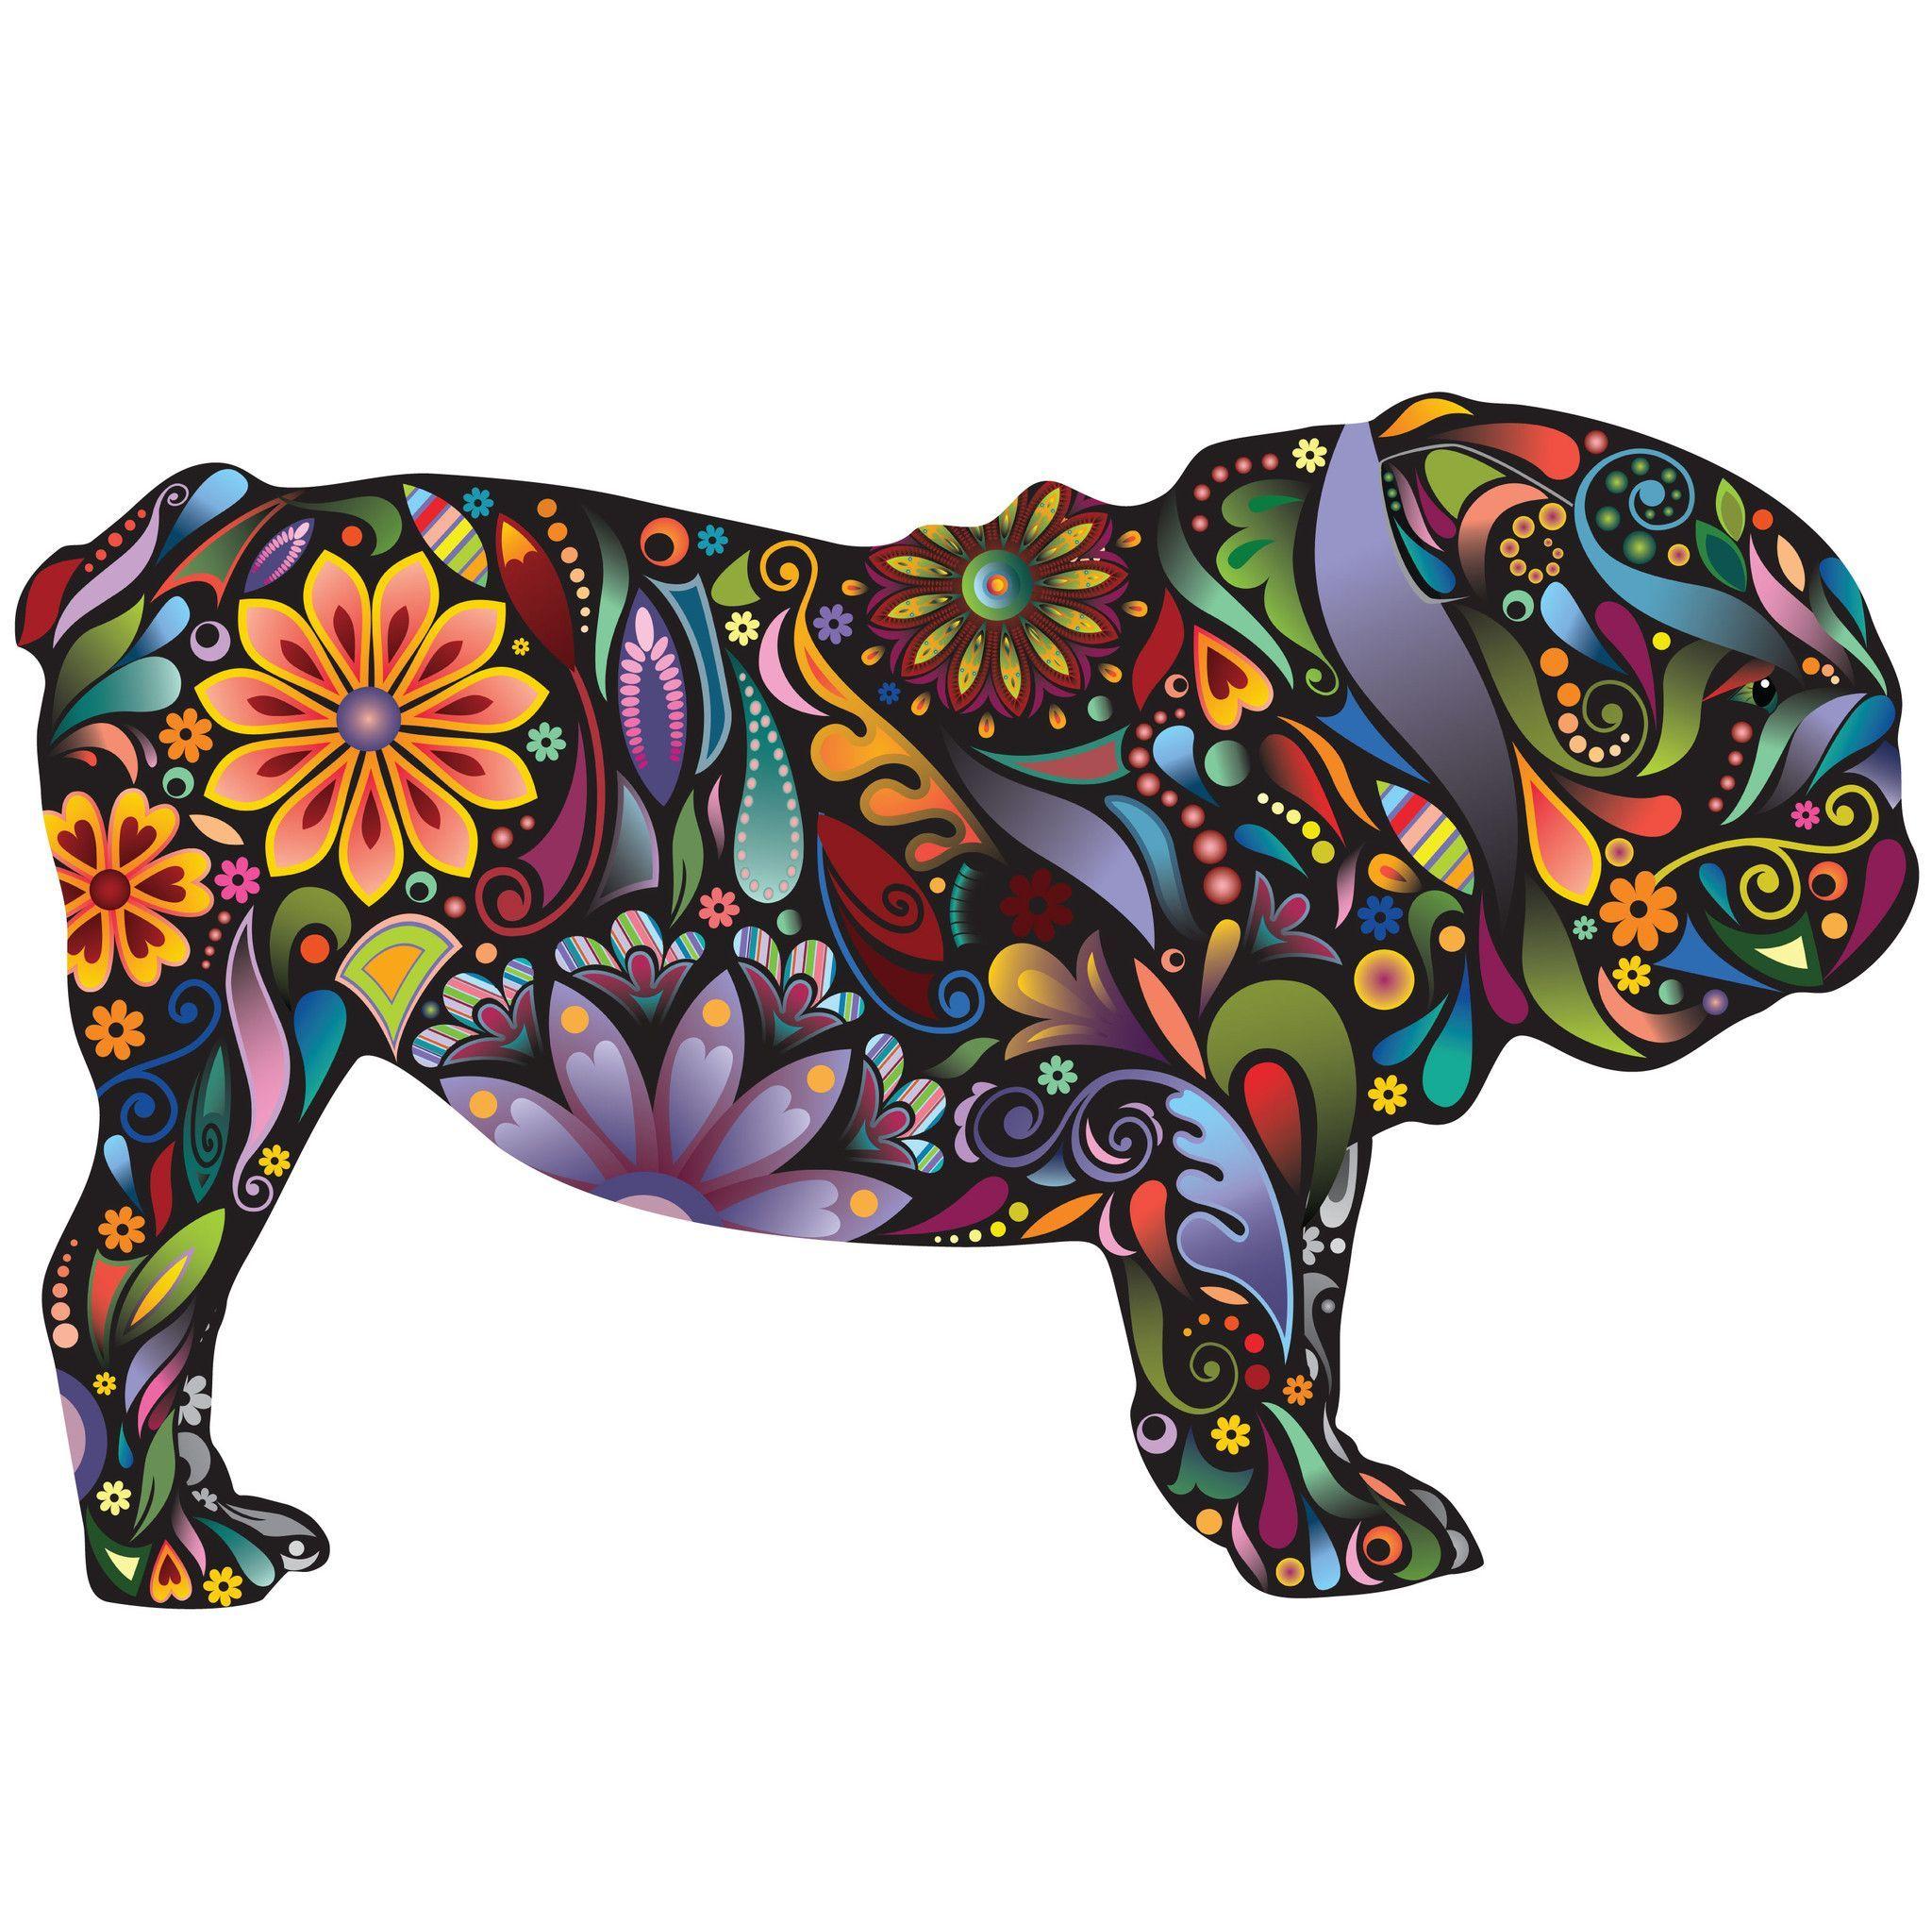 English Bulldog Dog Decal Wall Sticker